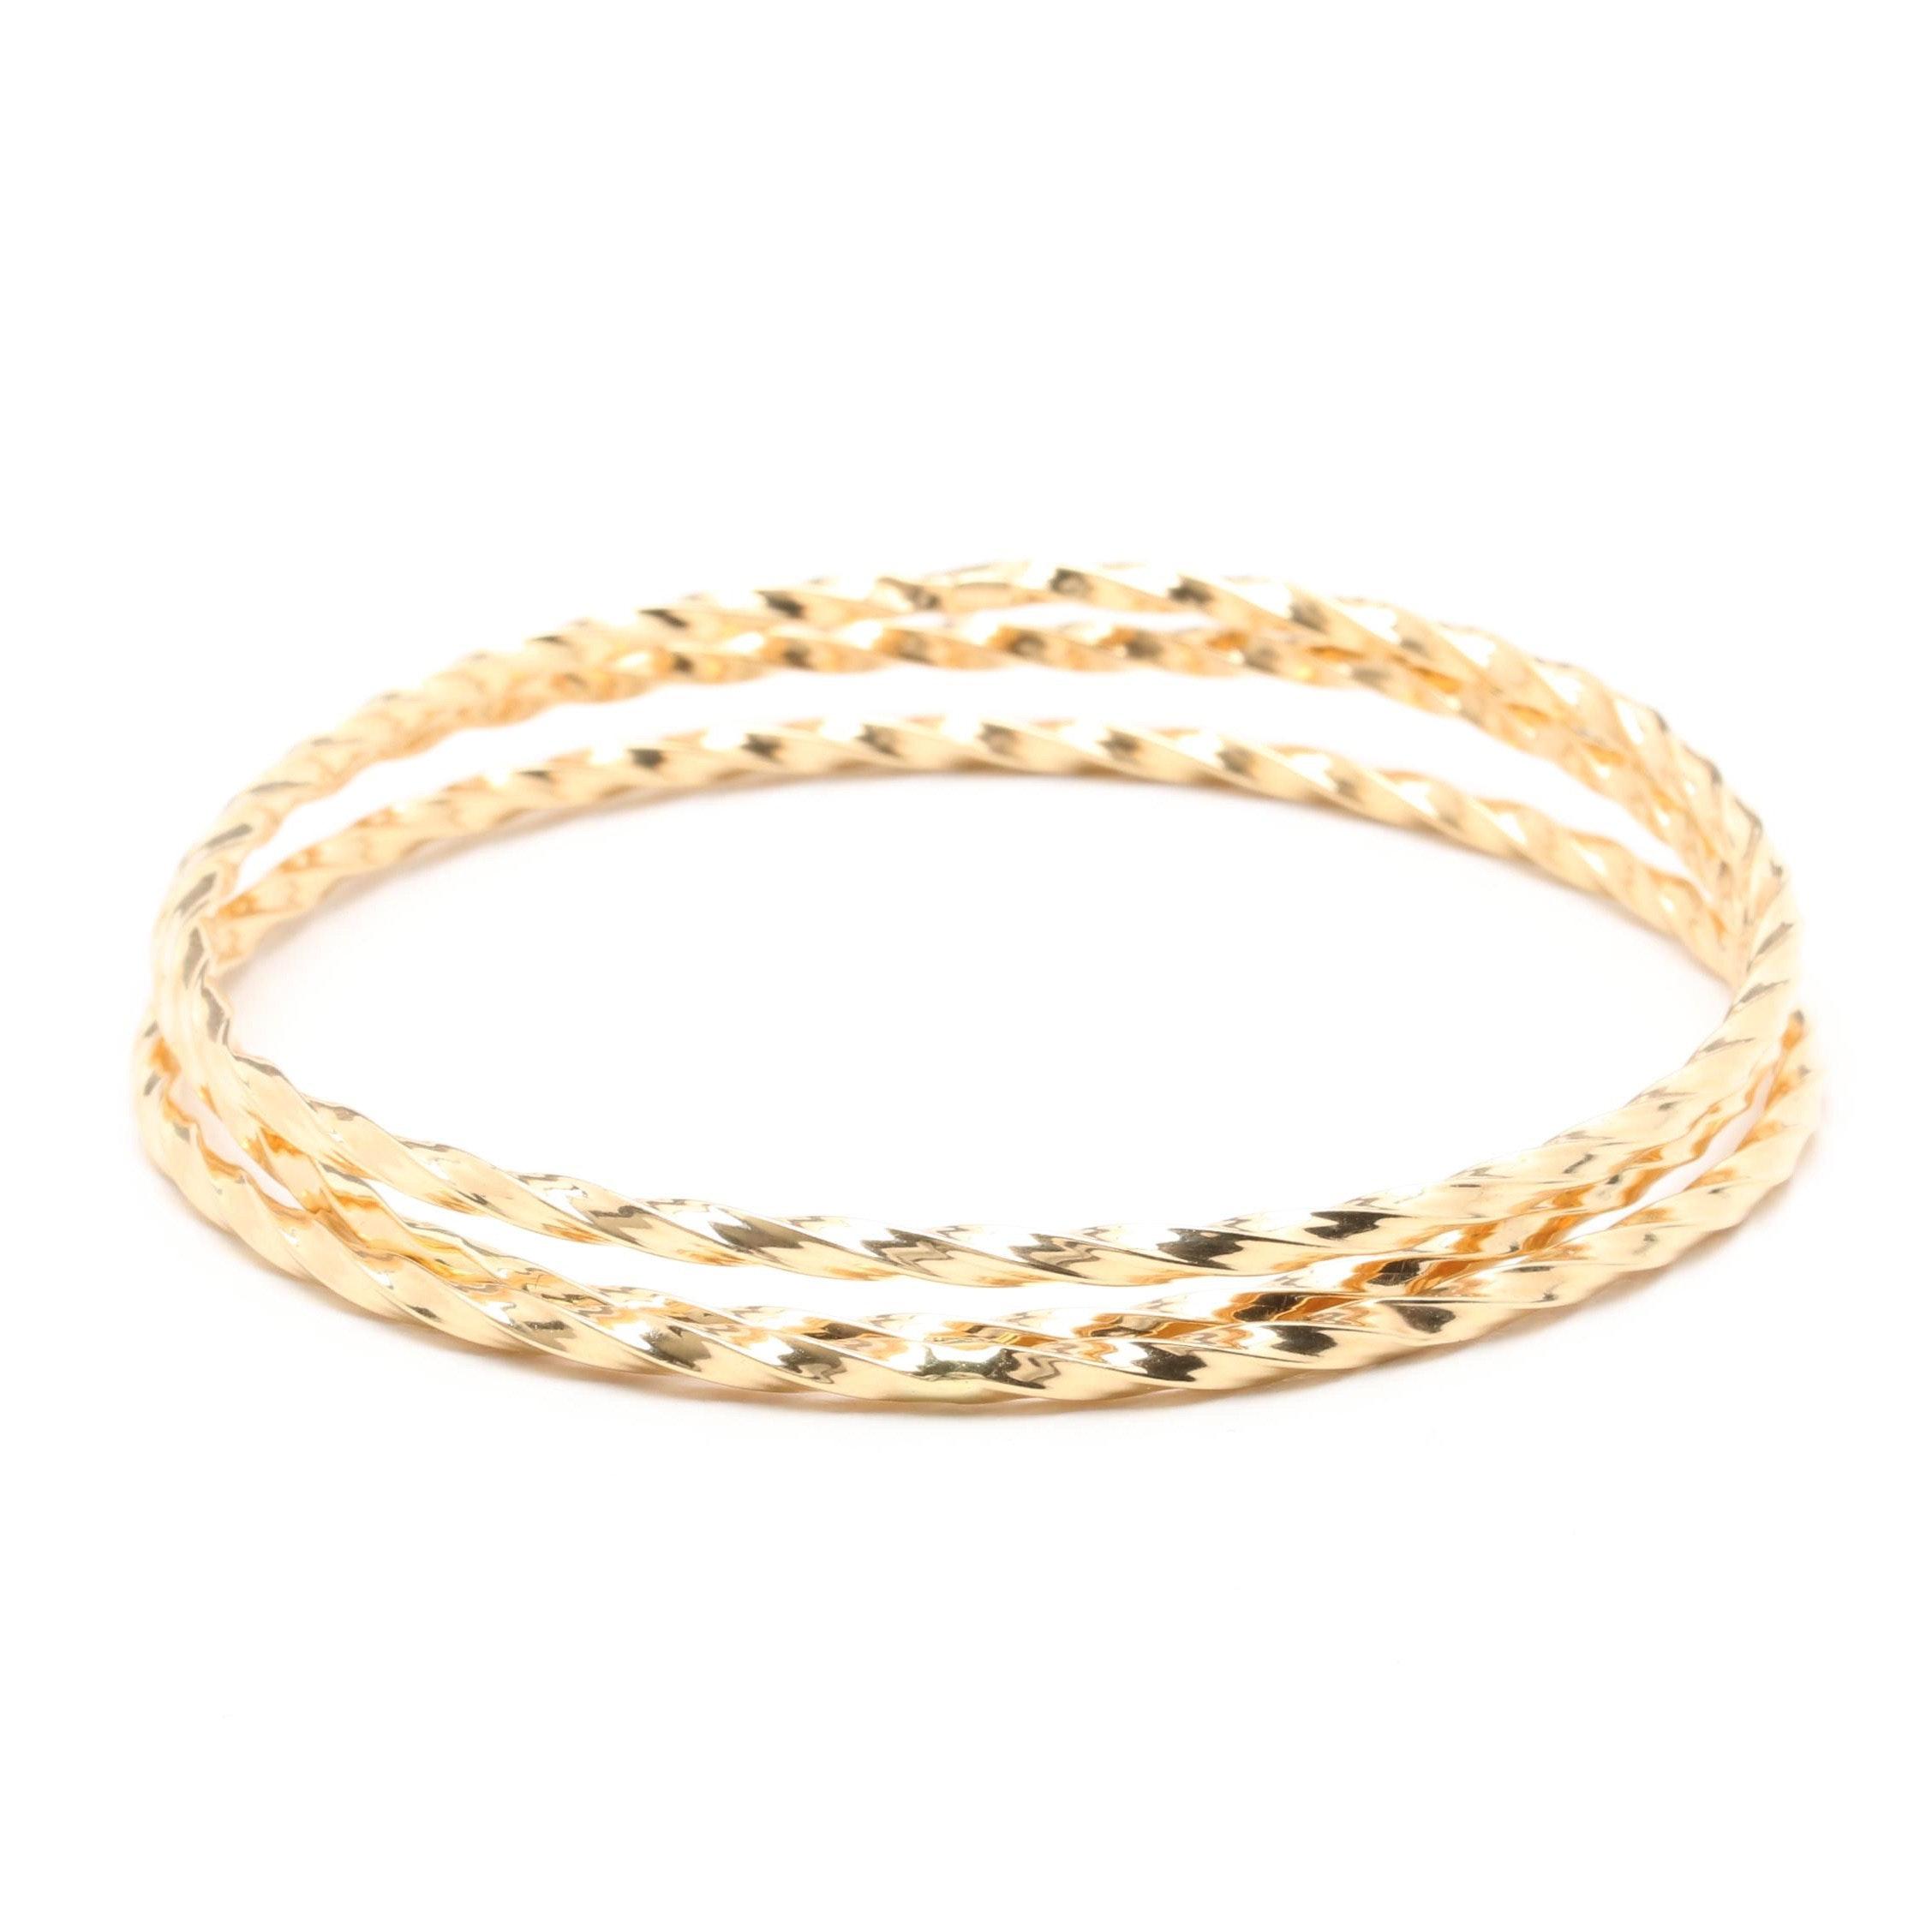 14K Yellow Gold Bangle Bracelet Selection